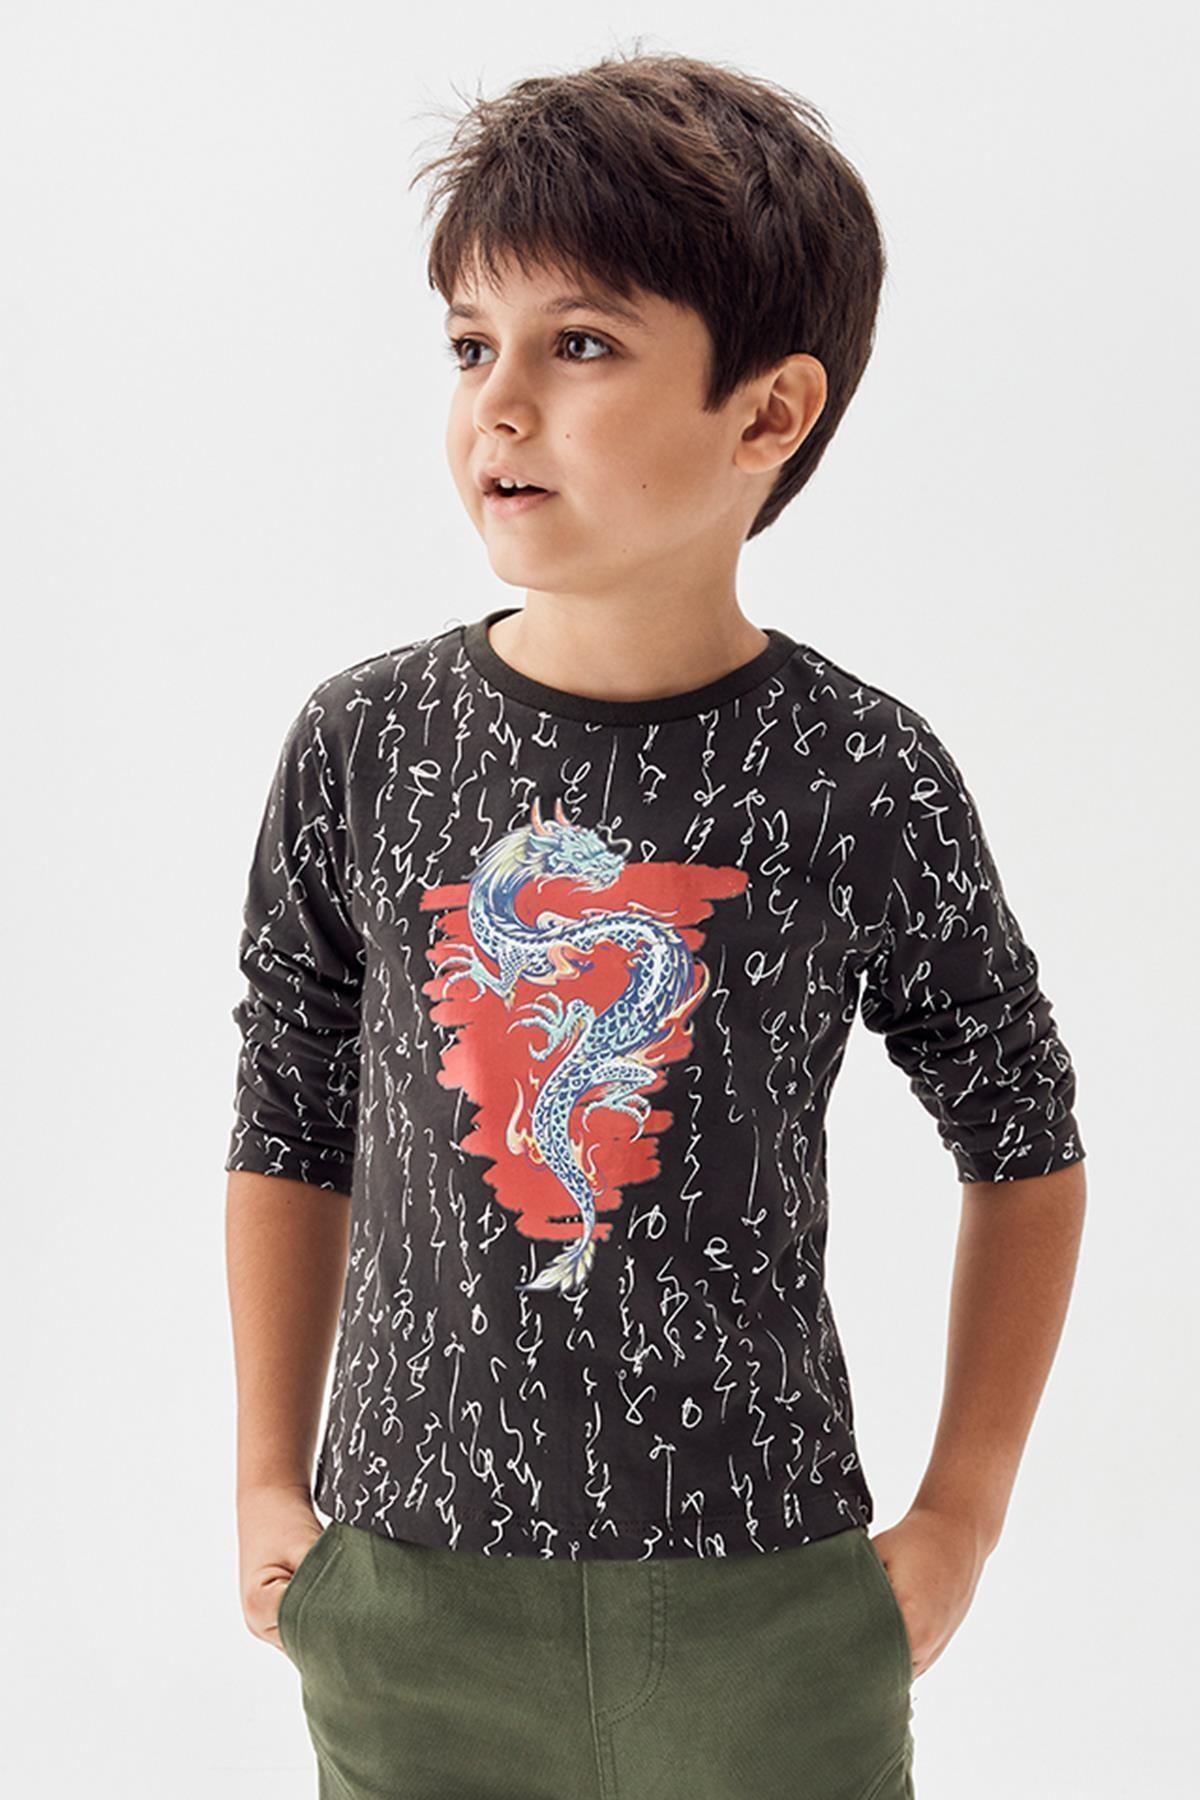 Nebbati Erkek Çocuk Haki T-shirt 20pfwnb3506 1